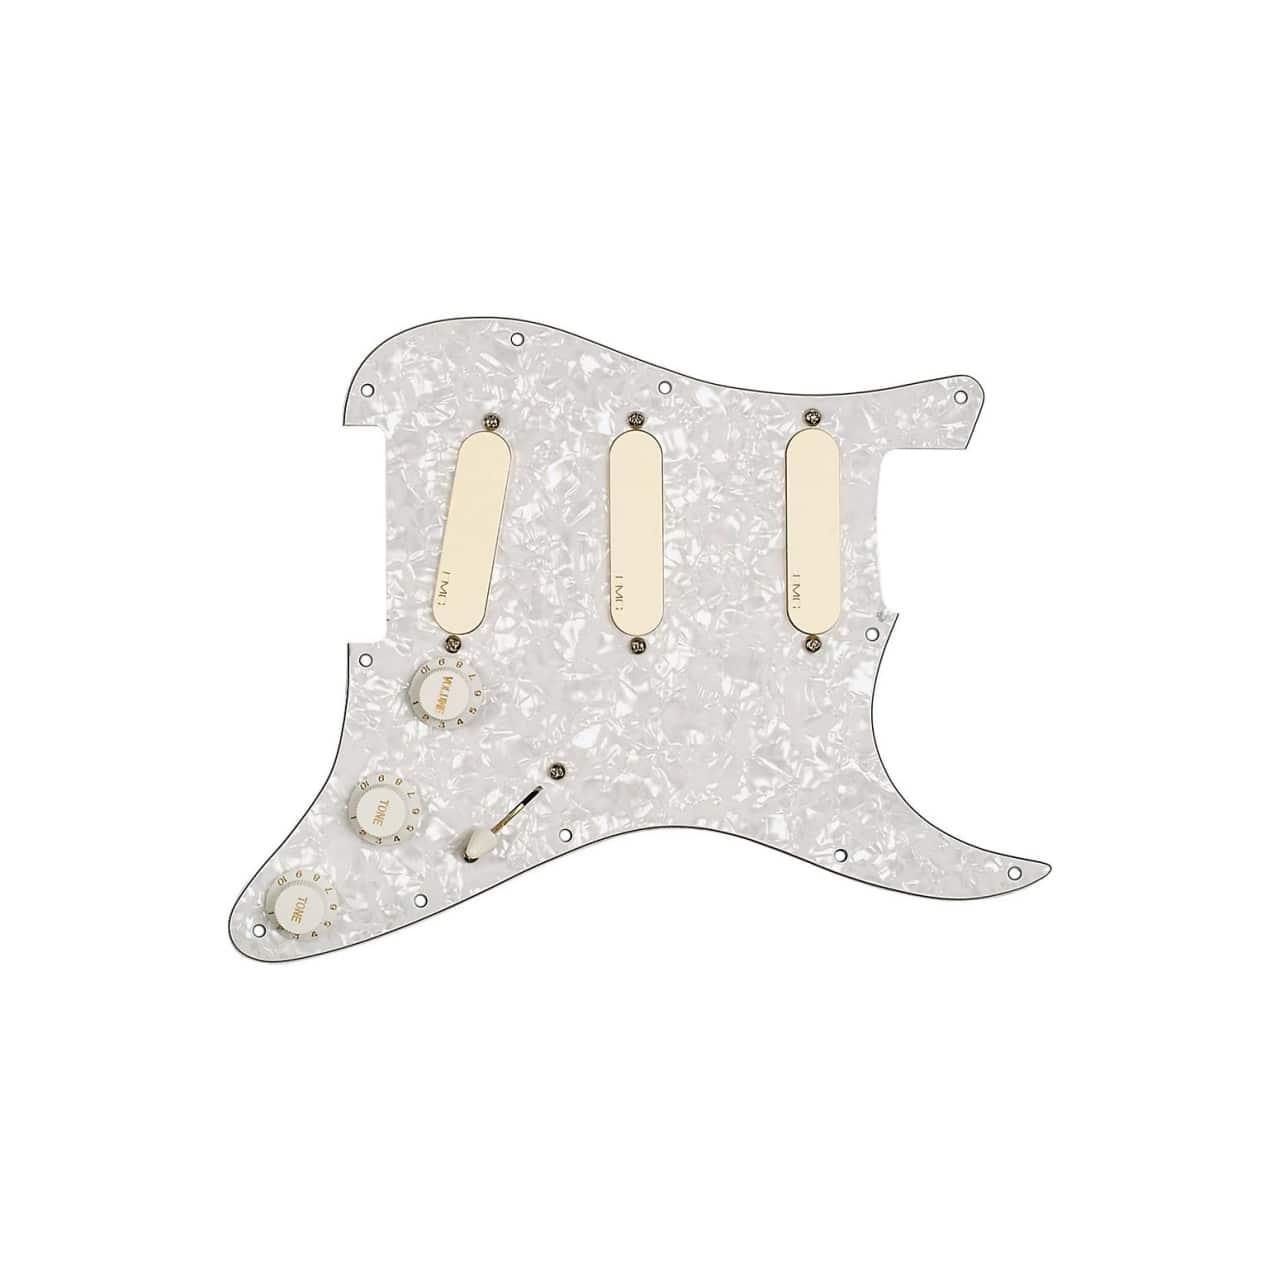 Wiring Diagram Emg Kh20 Library Strat Gilmour Dg20 David Pro Series Loaded Pickguard Ivory Reverb